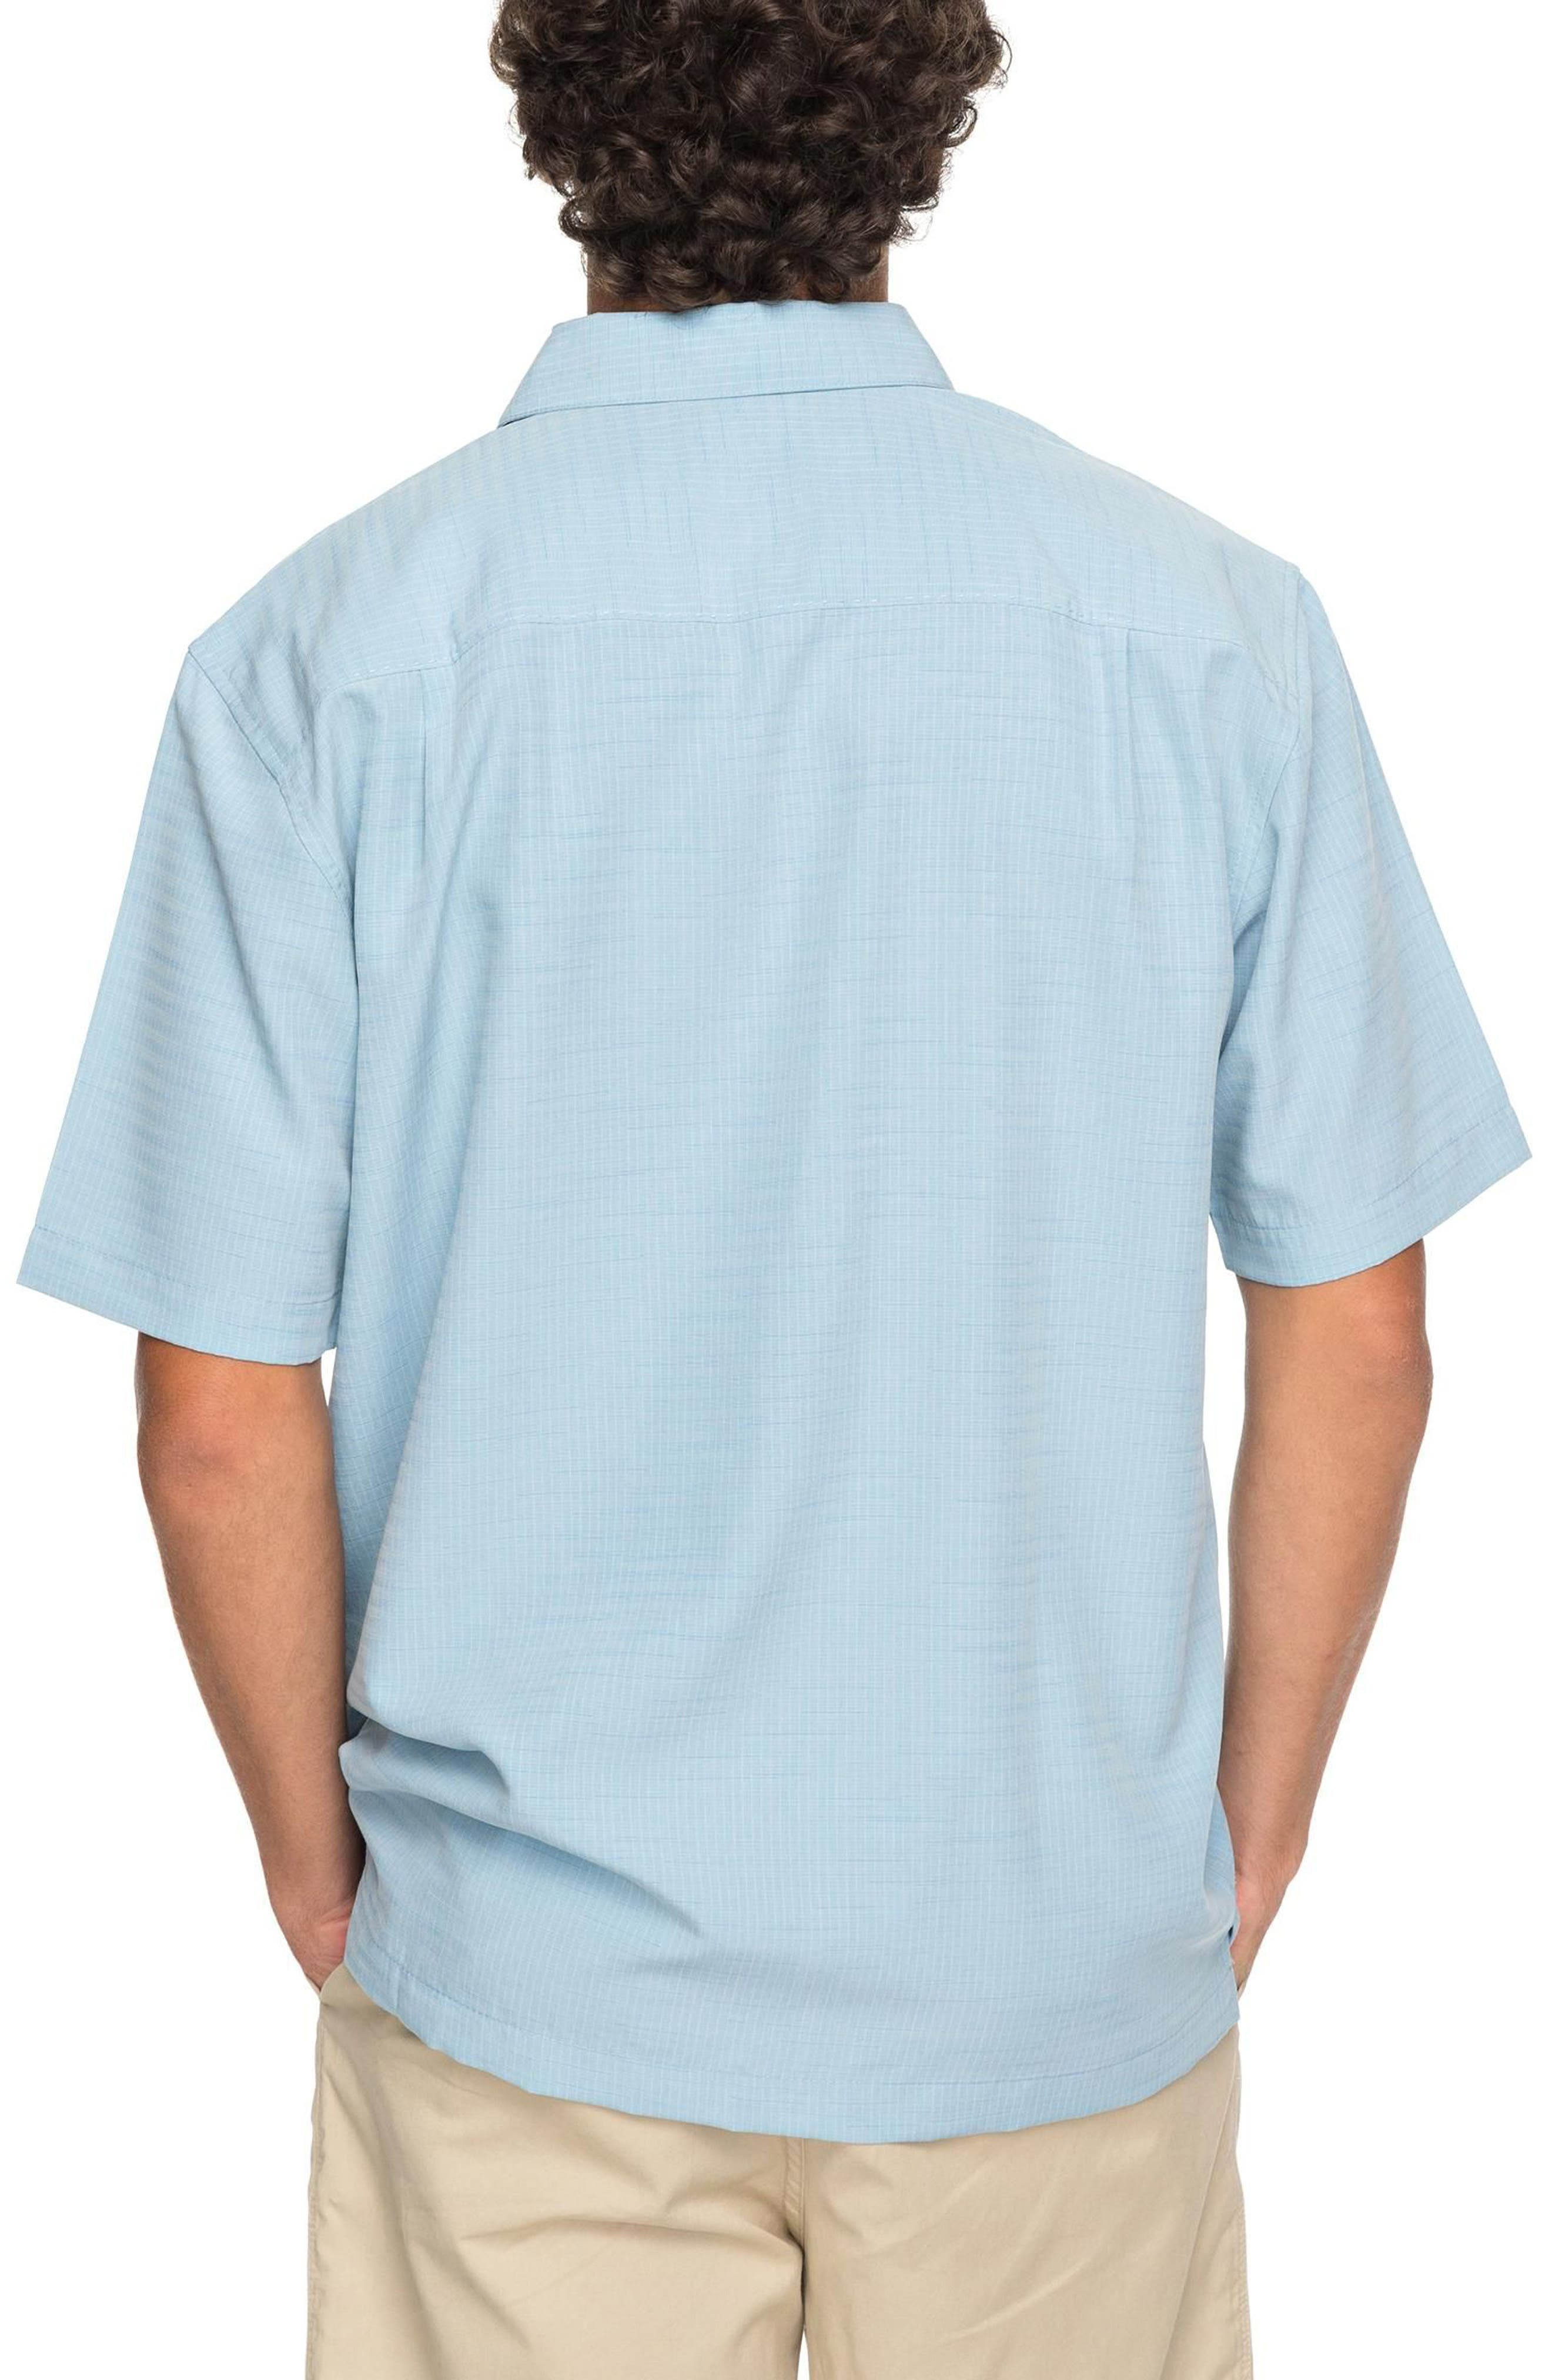 Centinala Shirt,                             Alternate thumbnail 2, color,                             Blue Shadow